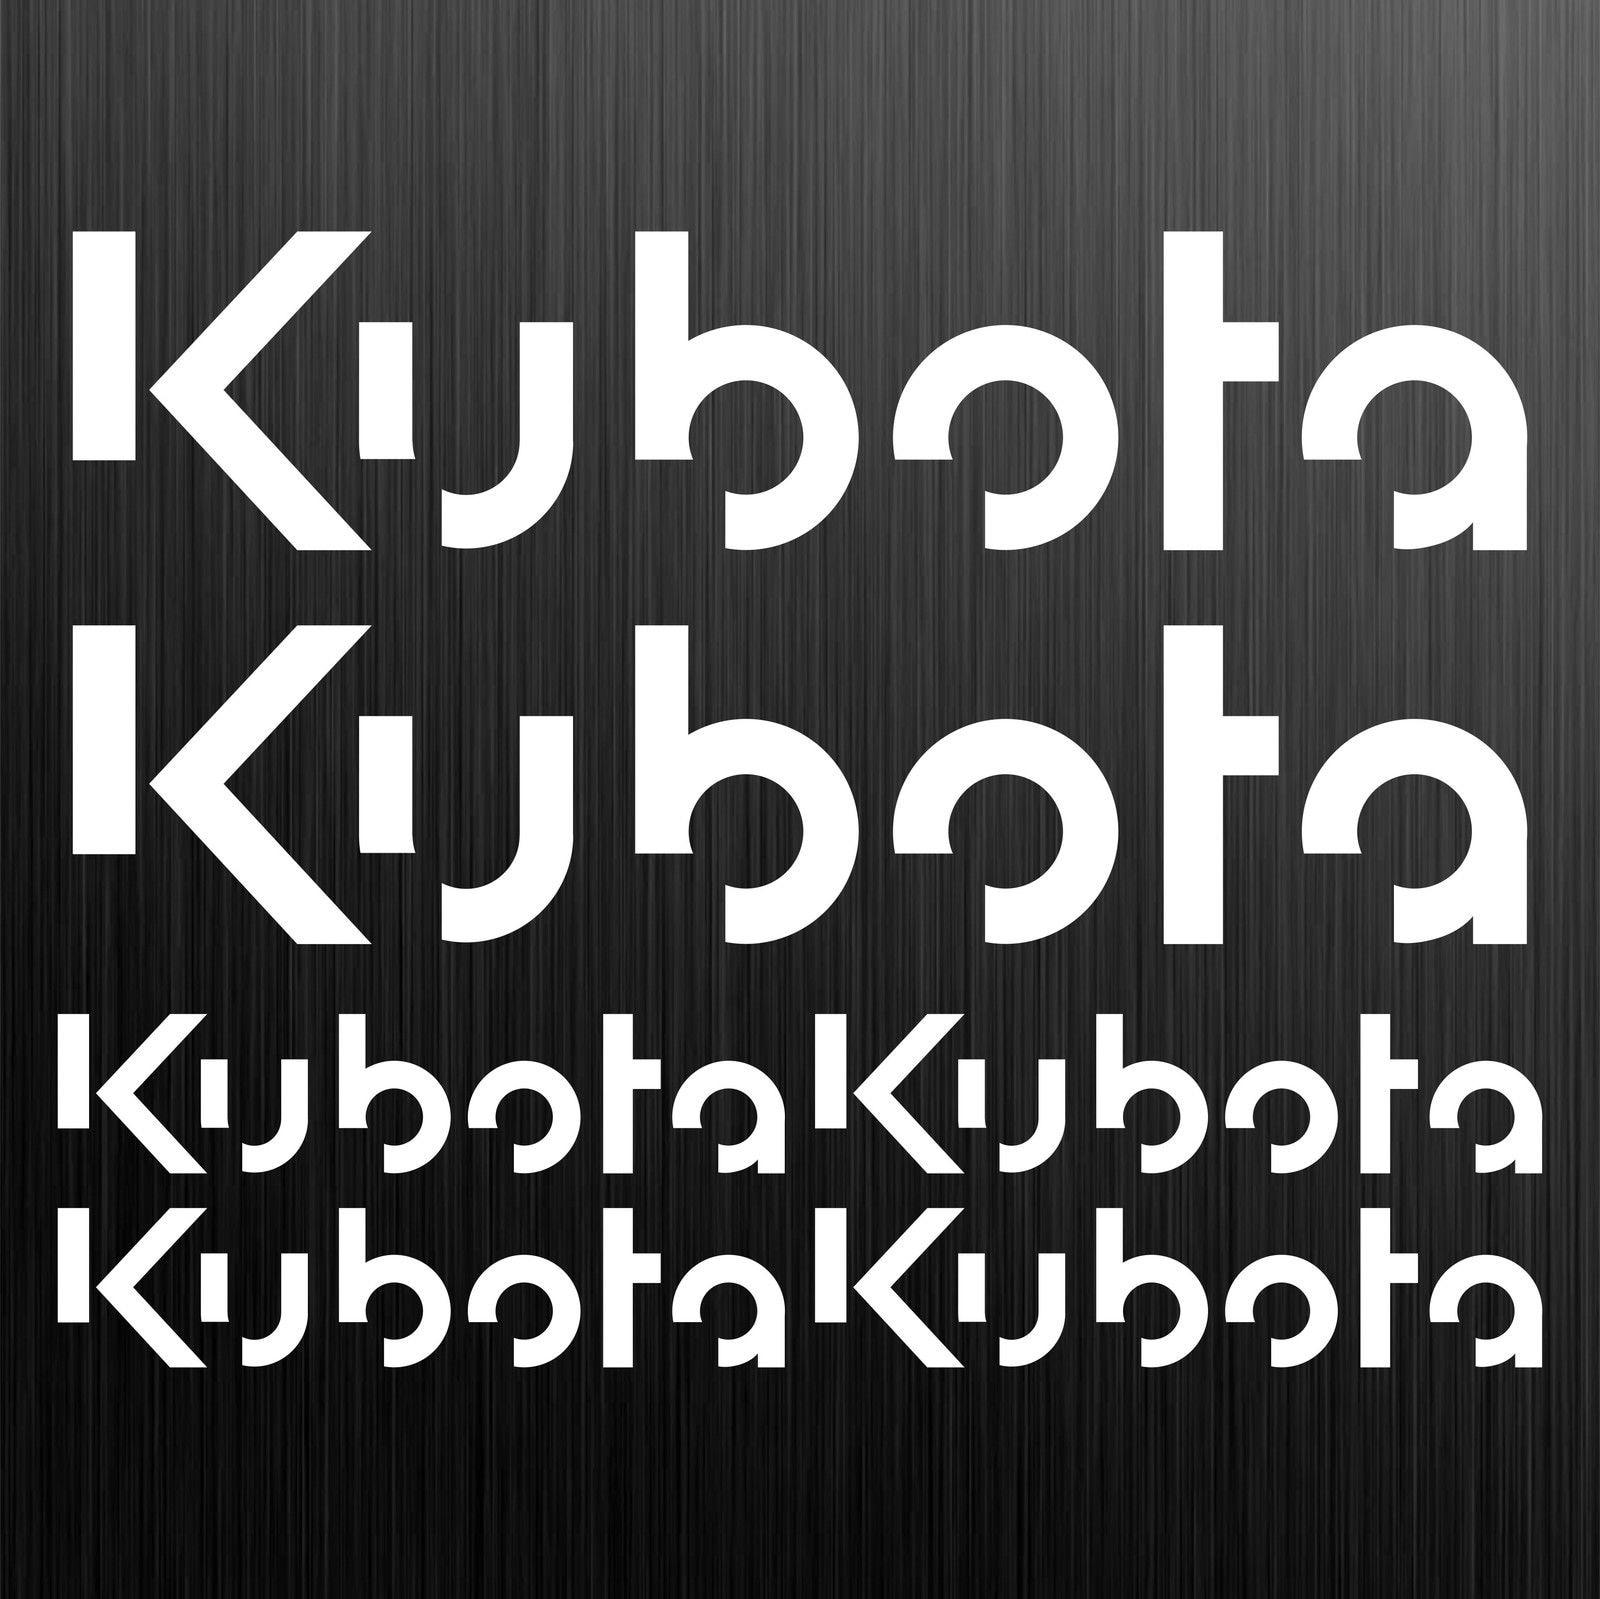 Para Kubota aufkleber de bagger excavadora minibager 6 etiqueta engomada de estilo de coche